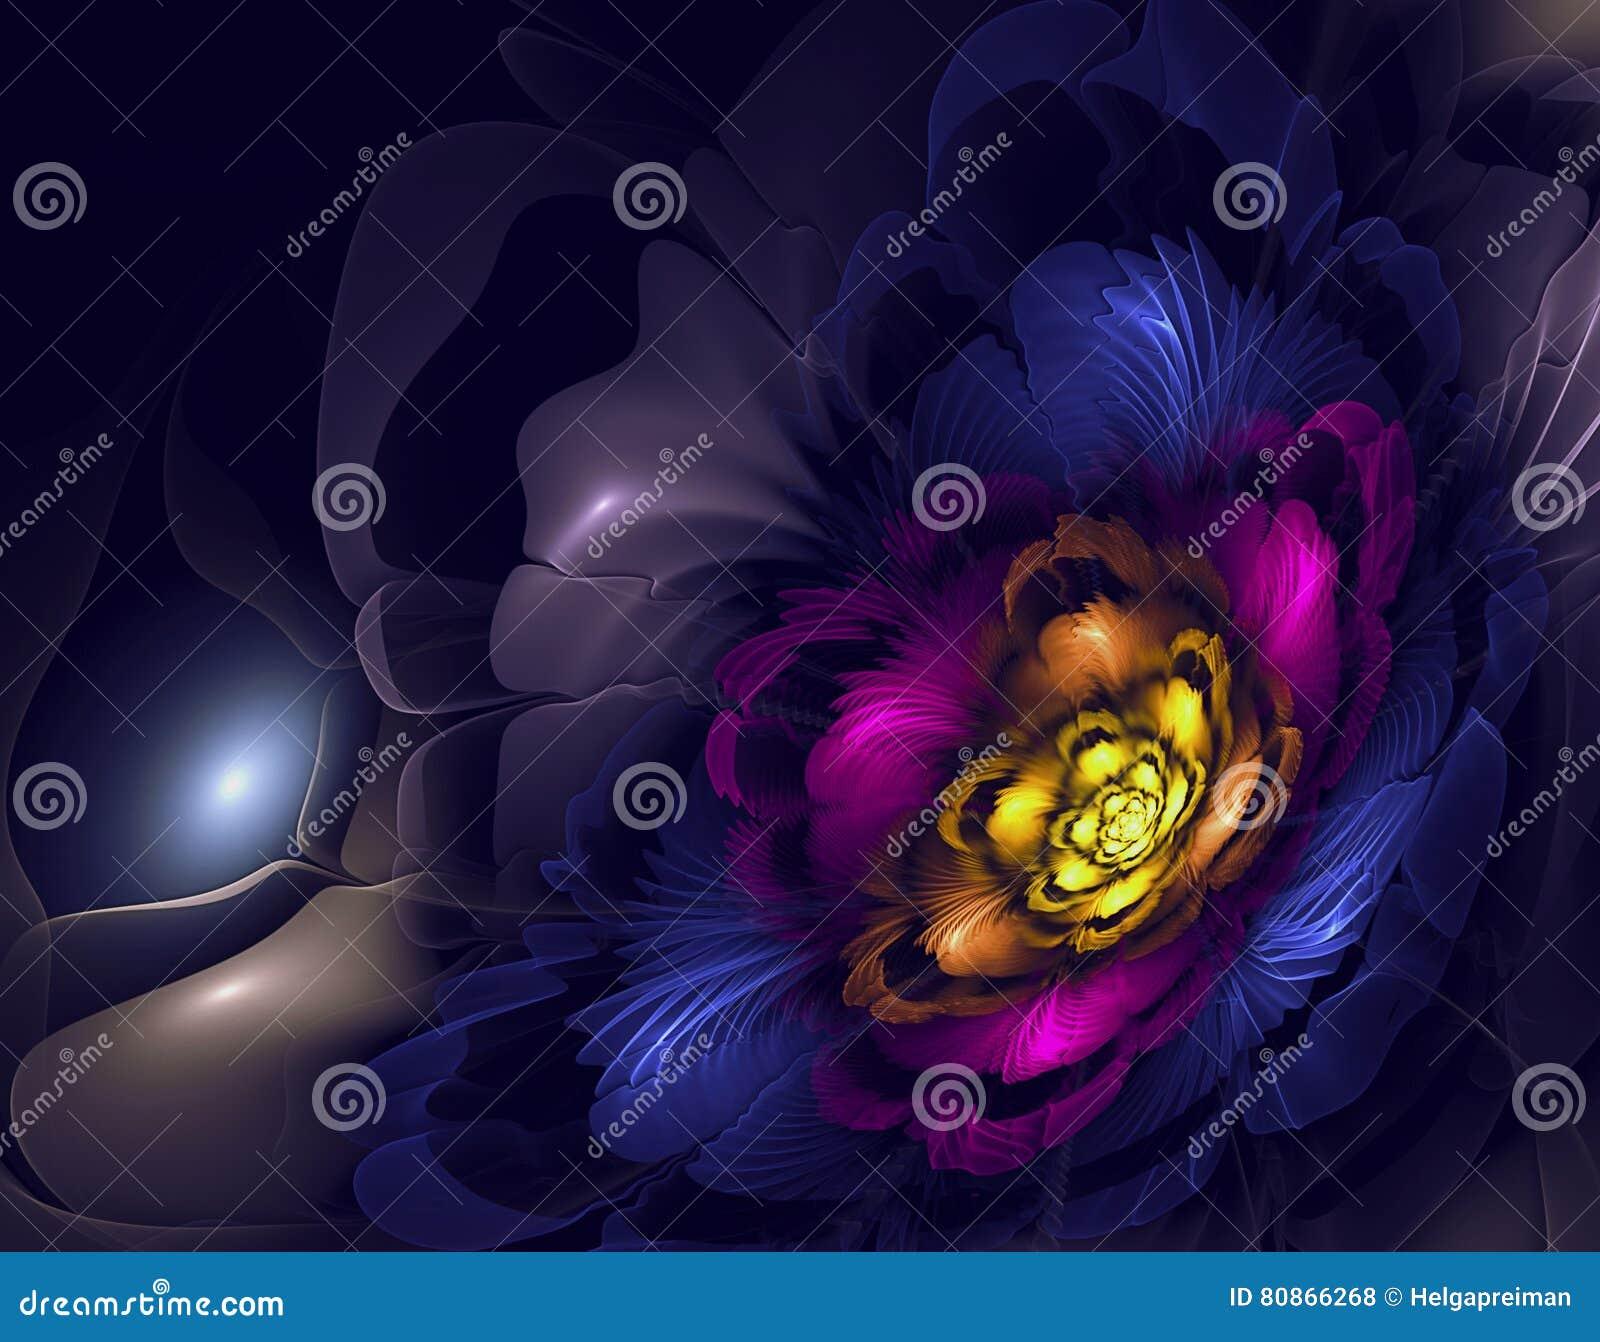 Download Abstract fractal image stock illustration. Illustration of decor - 80866268